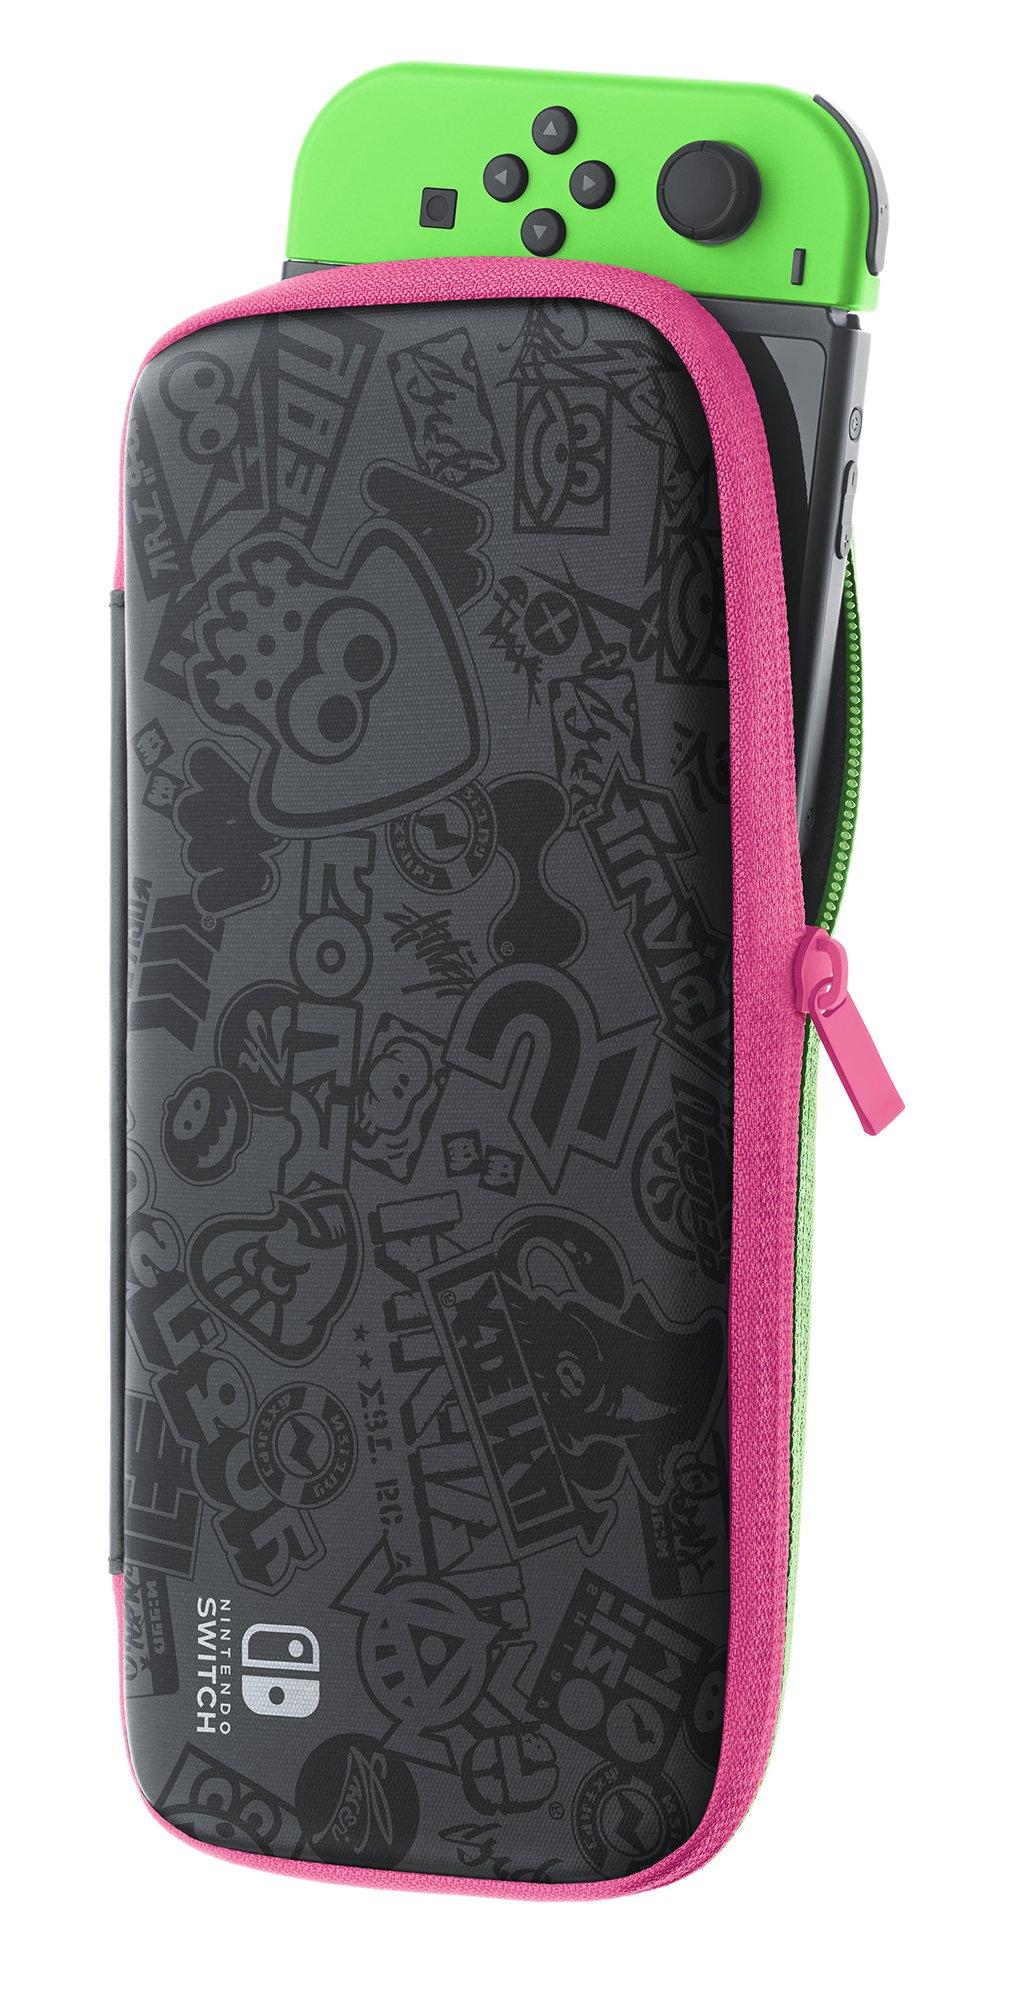 Nintendo Switch Hardware with Splatoon 2 + Neon Green/Neon Pink Joy-Cons (Nintendo Switch) by Nintendo (Image #7)